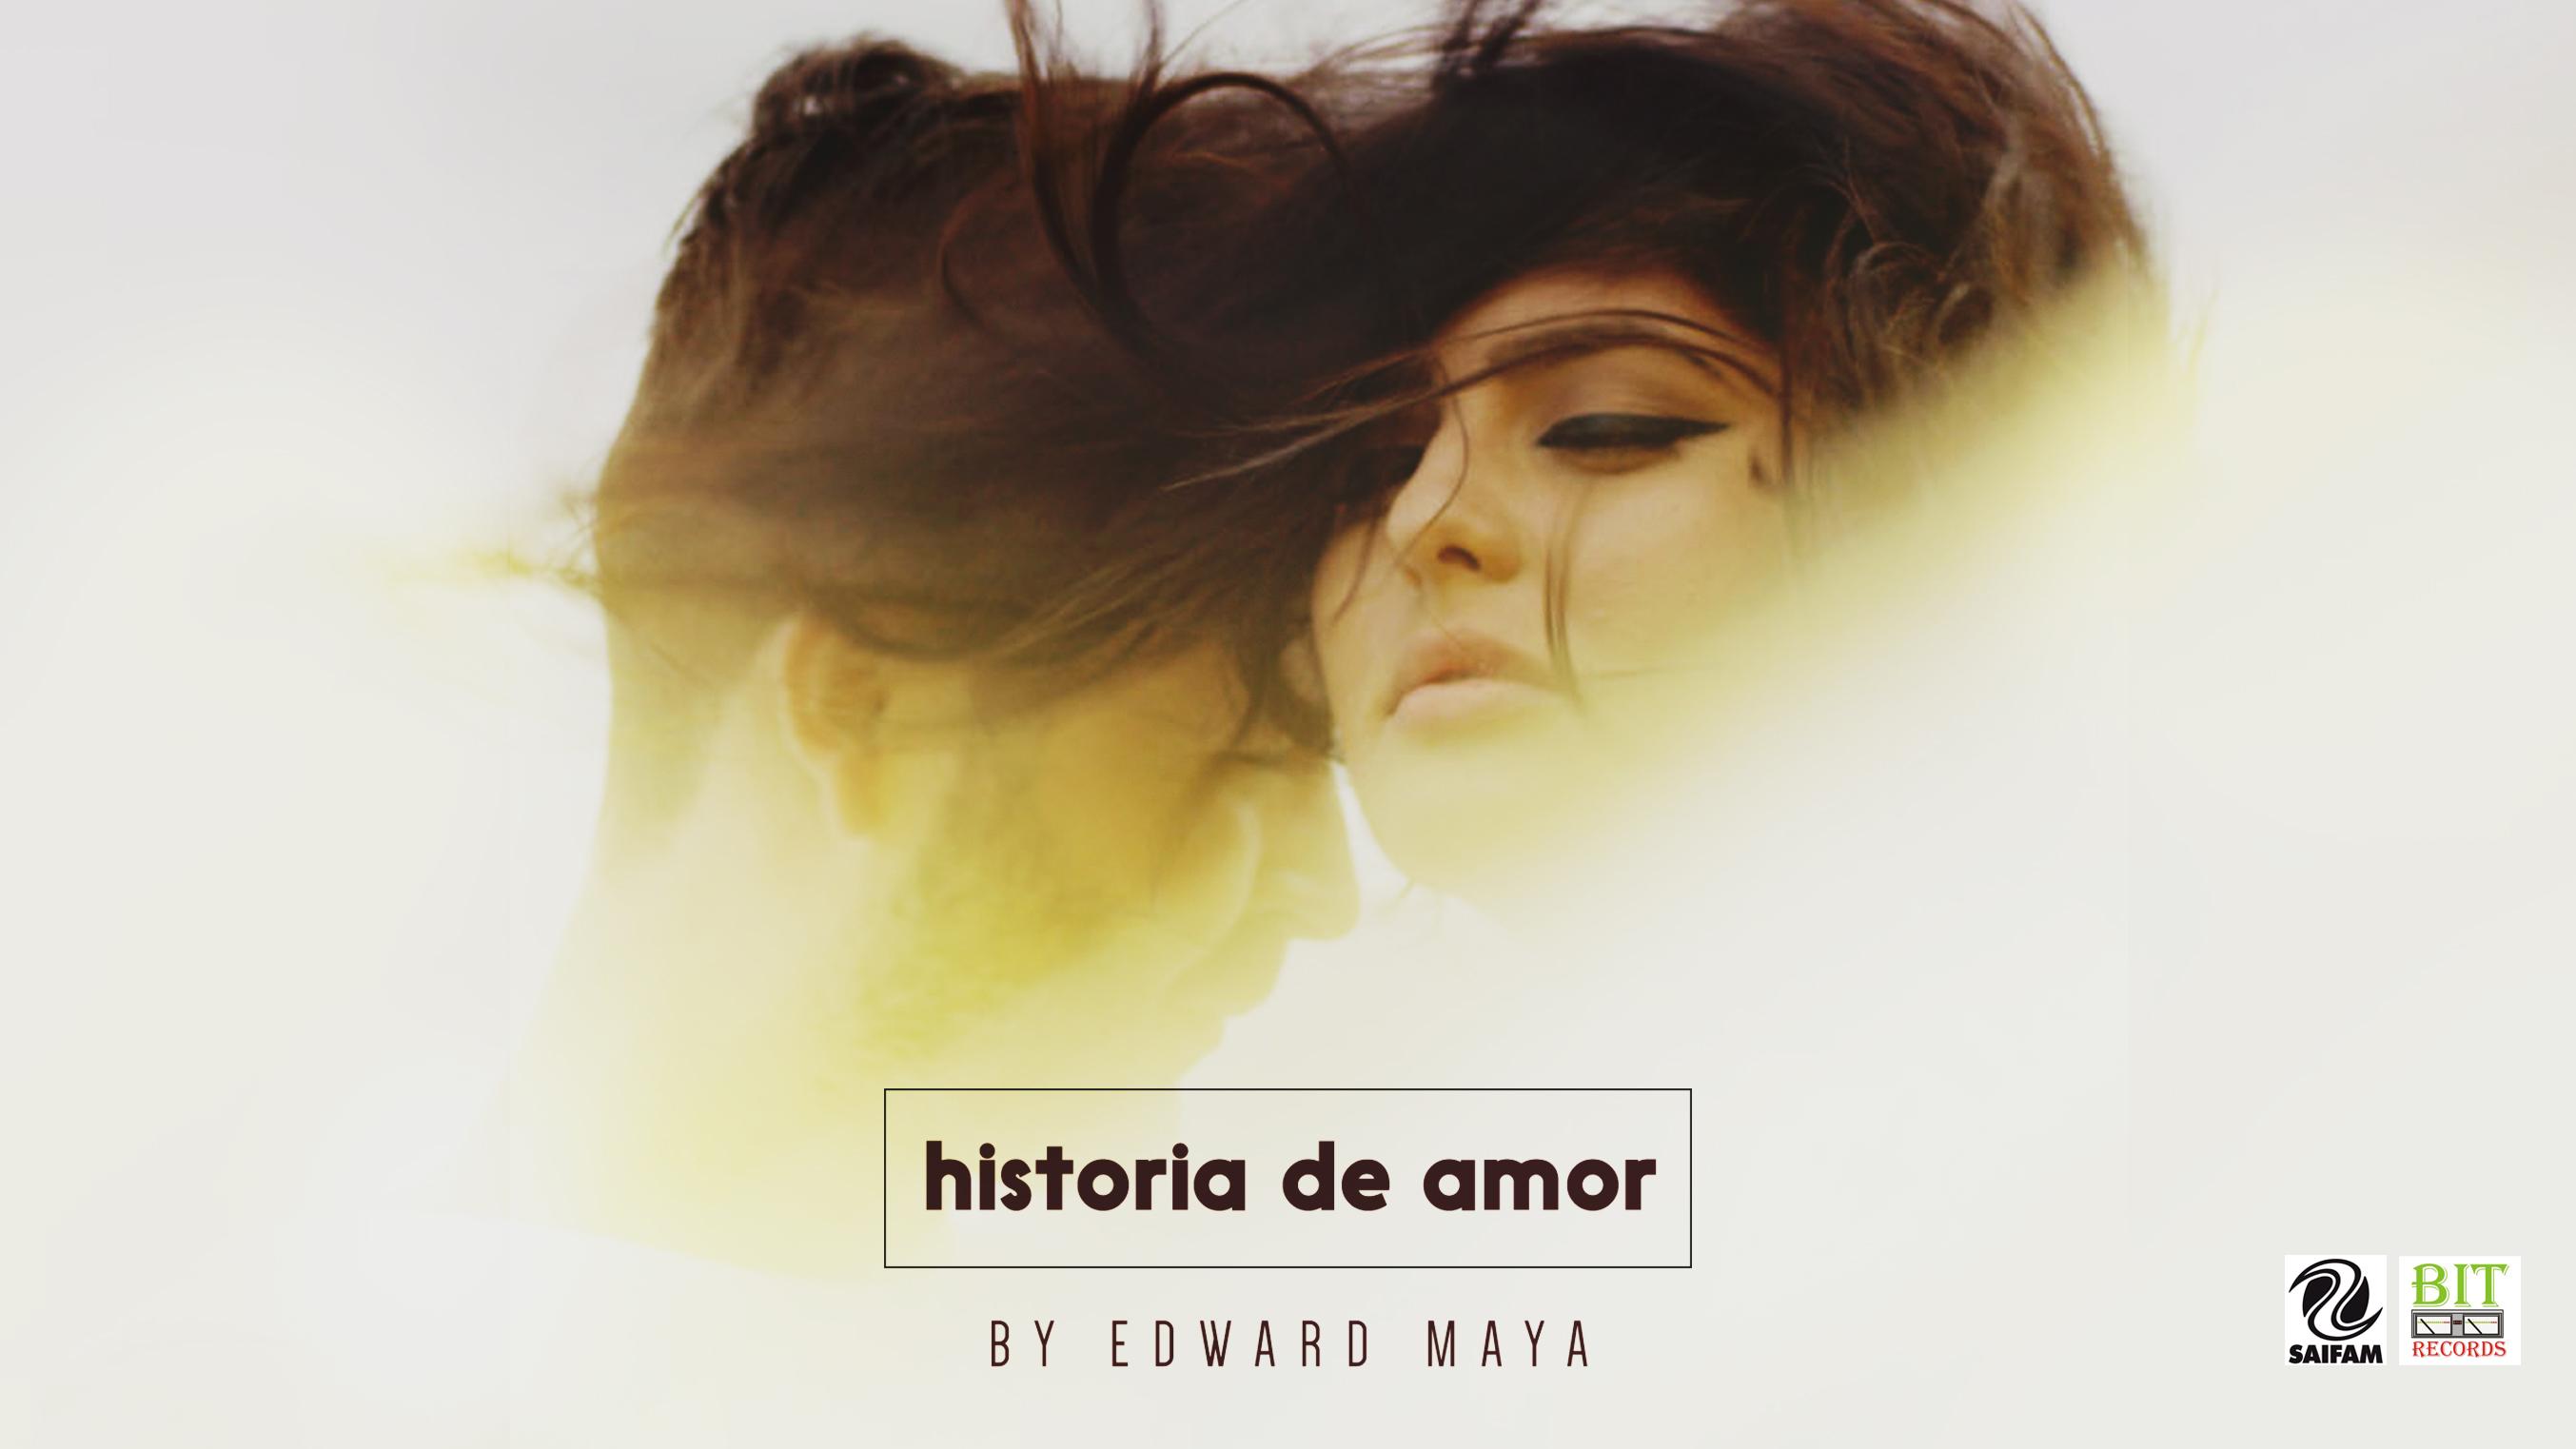 Edi-Historia-de-amor-2youtube OK